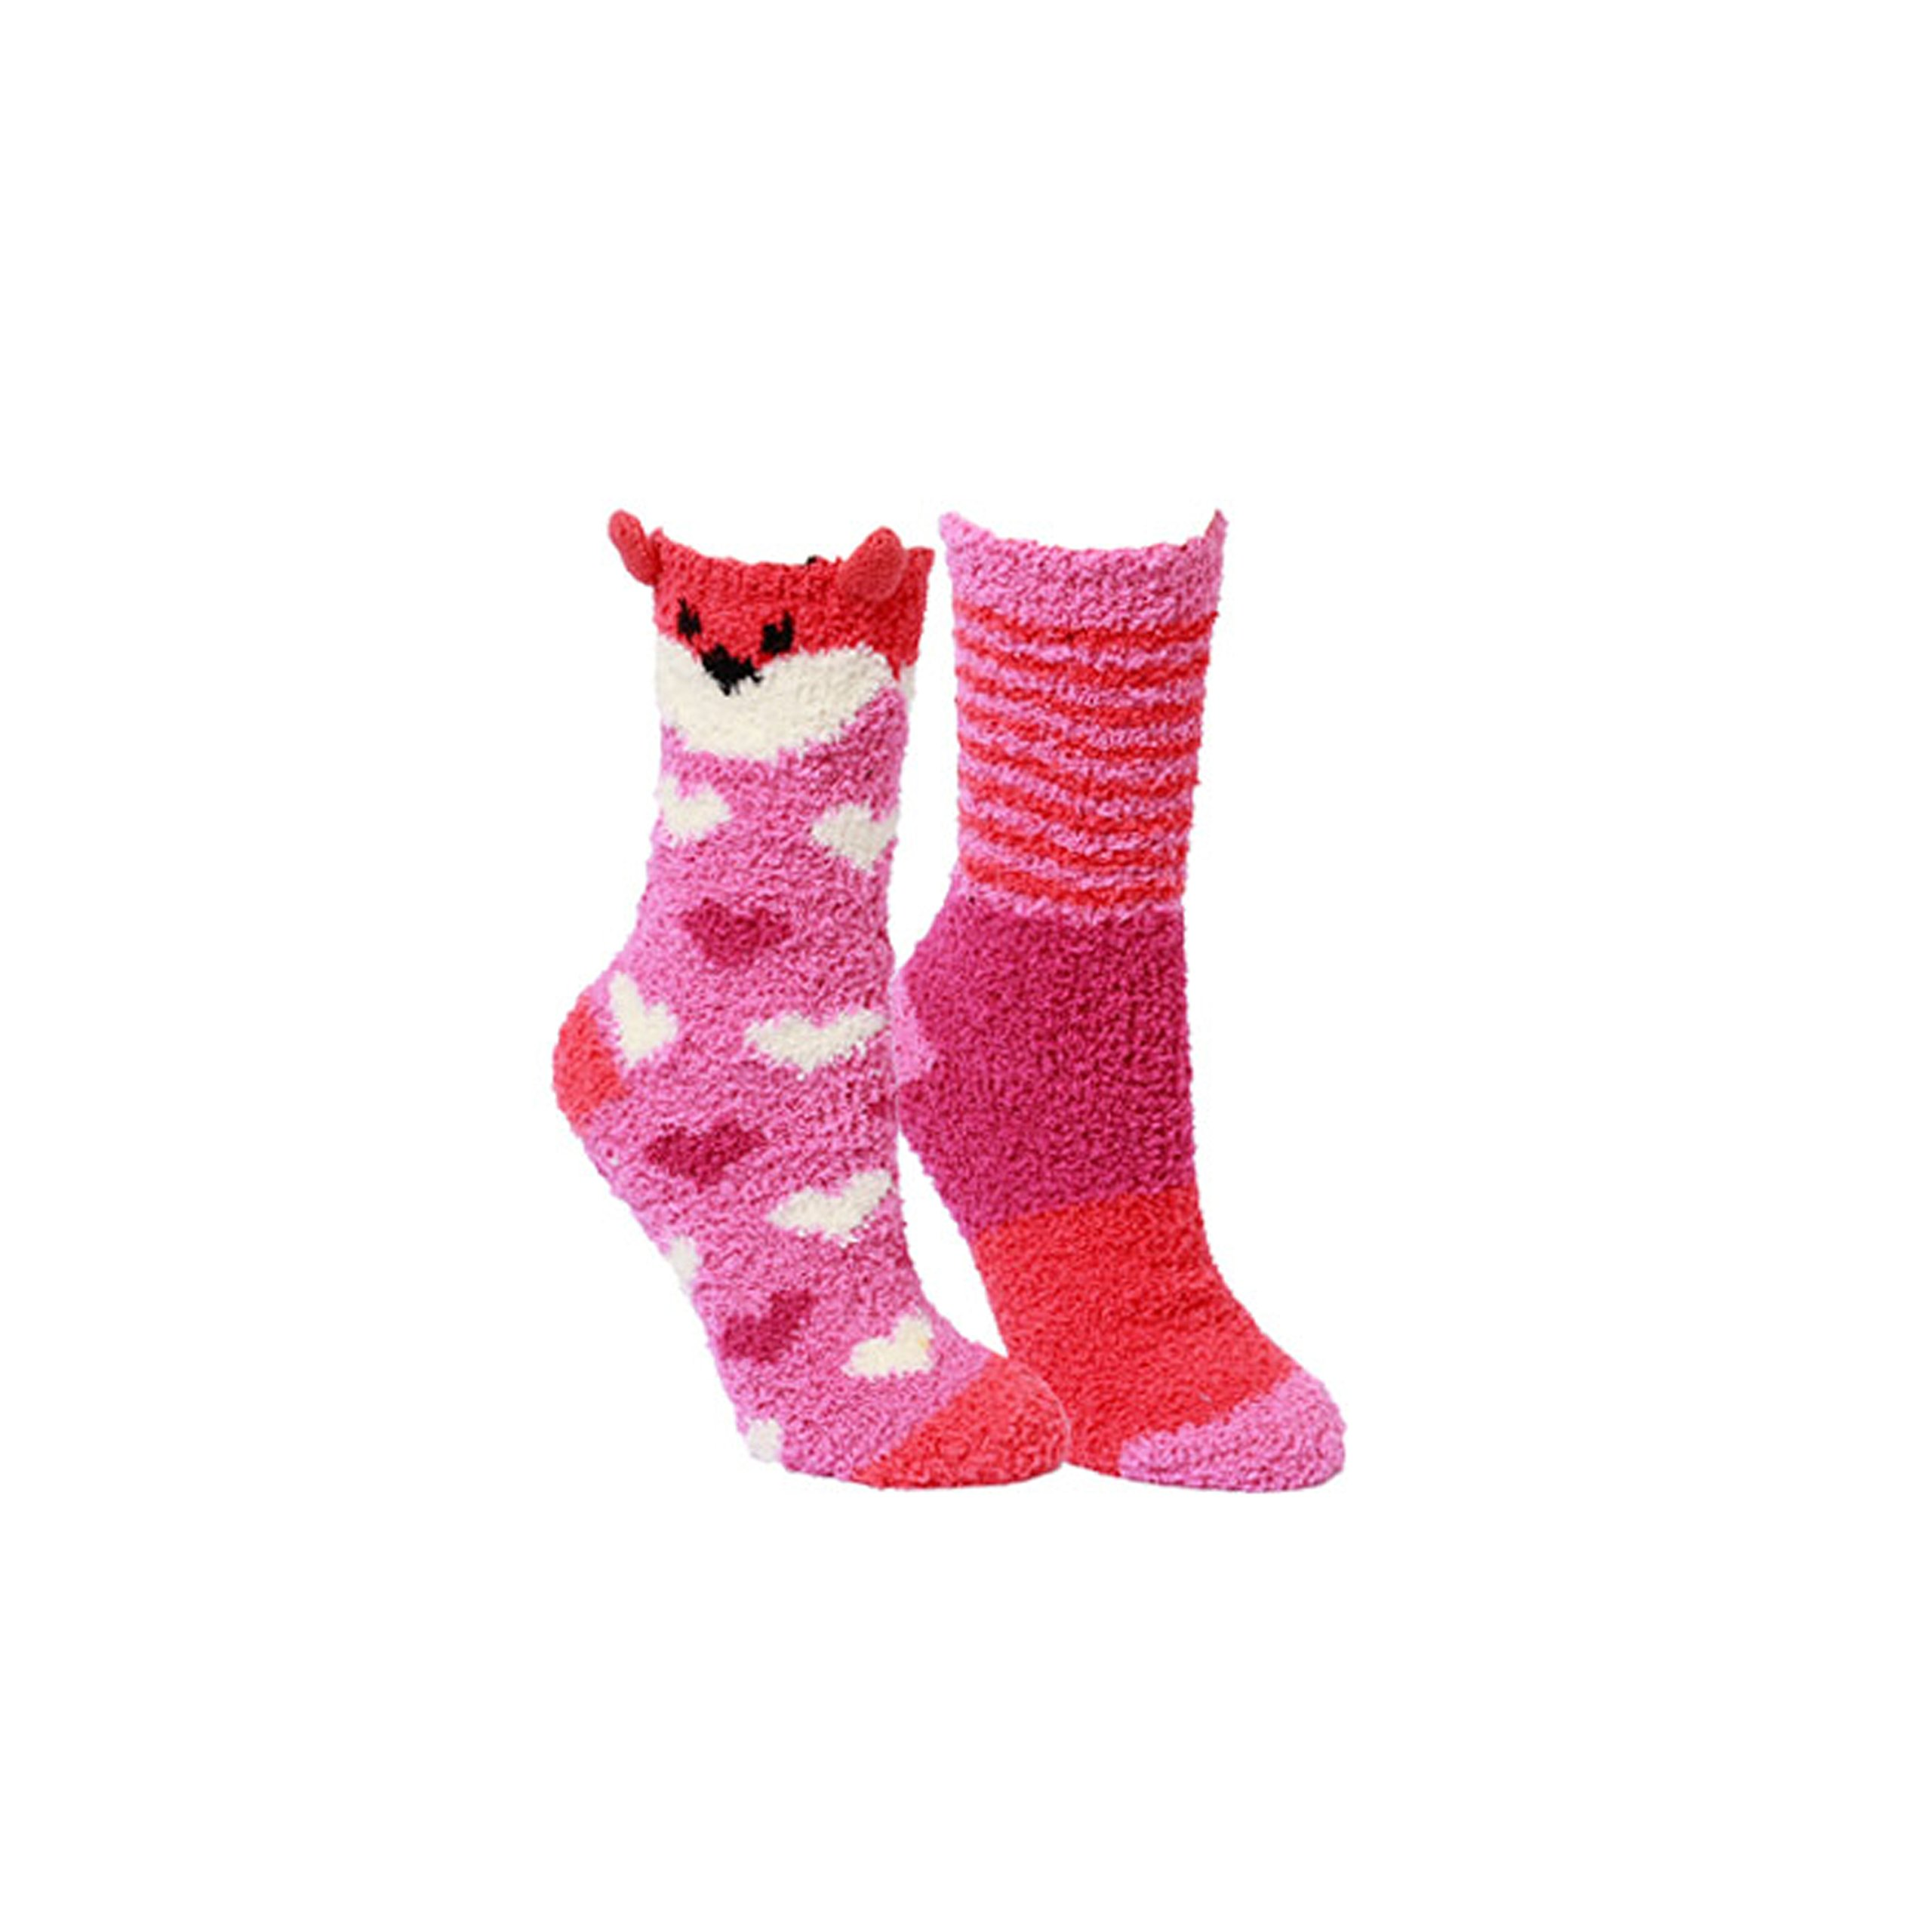 Cute Animal Ultra Soft Chenille Fleece Slipper Socks Women's Winter Fuzzy House Sock- 2 Pack (Fox)